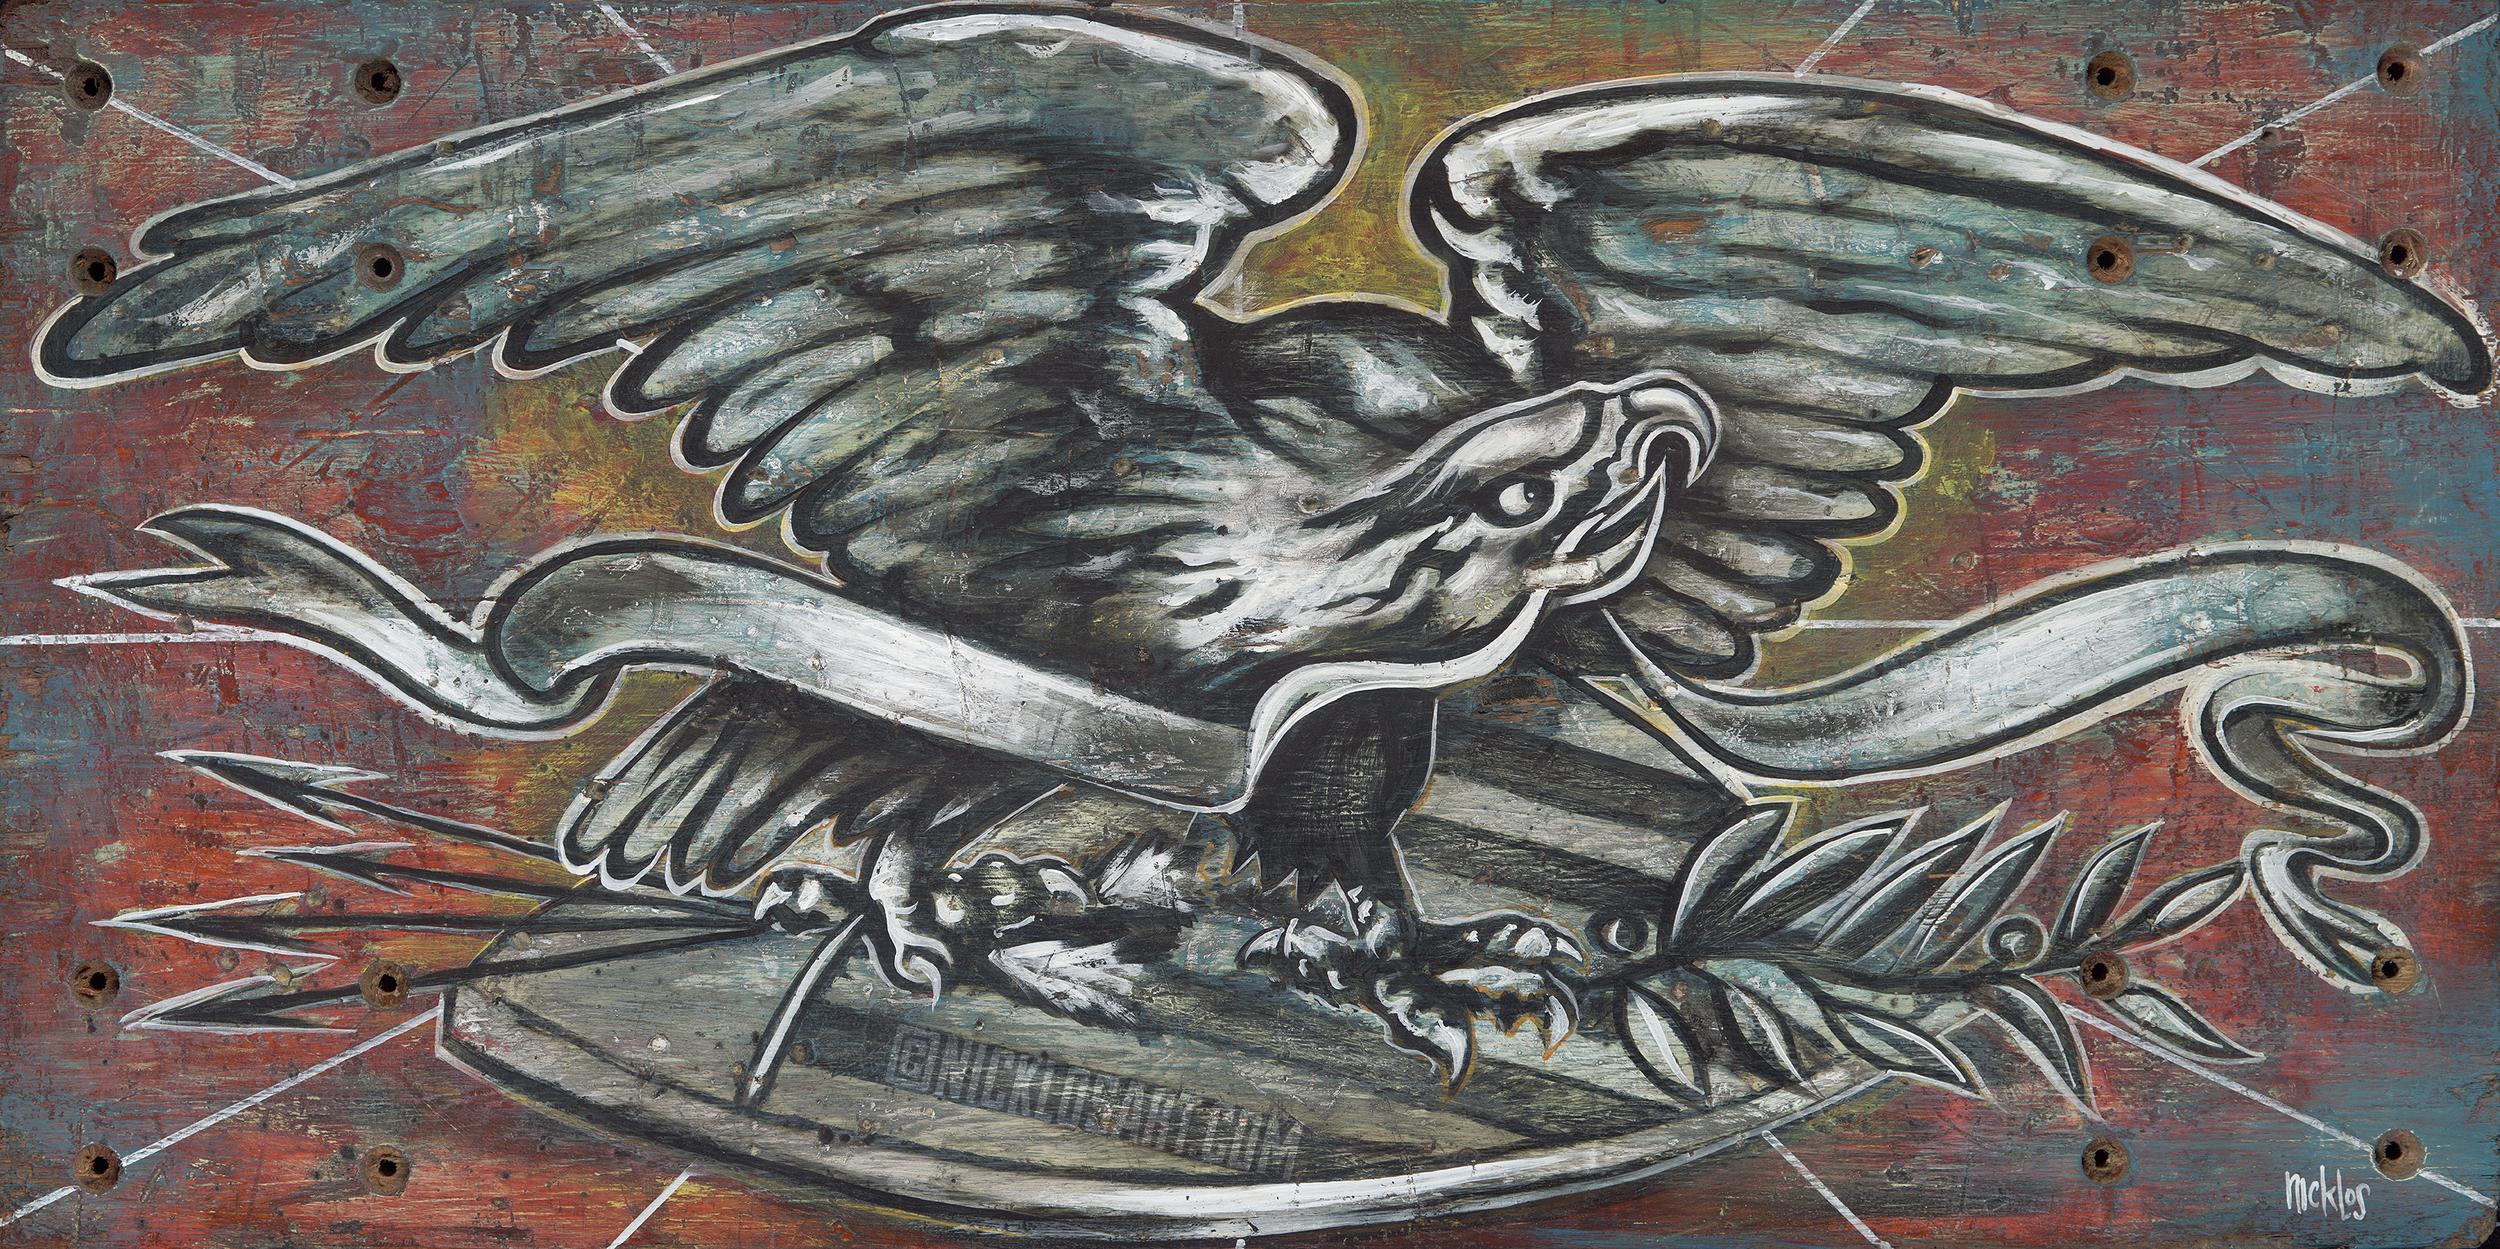 Americana Folk Art ('Merica)